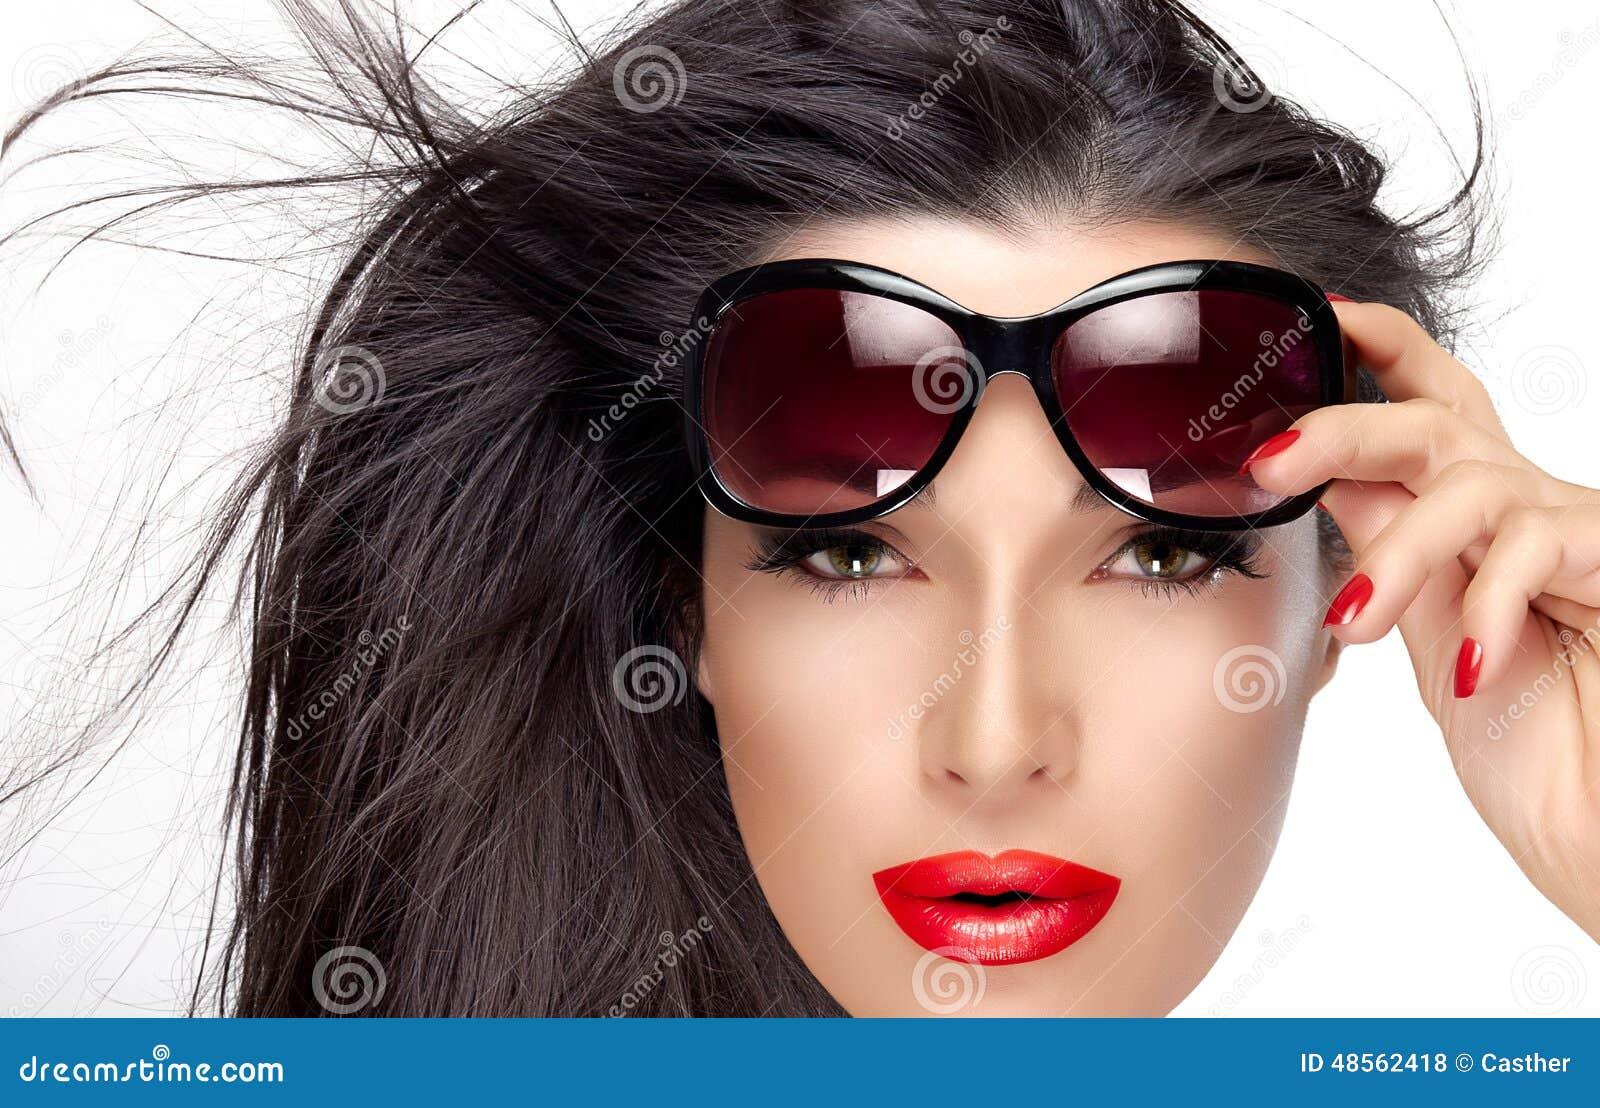 Holding Fashion Sunglasses modelo hermoso en la frente